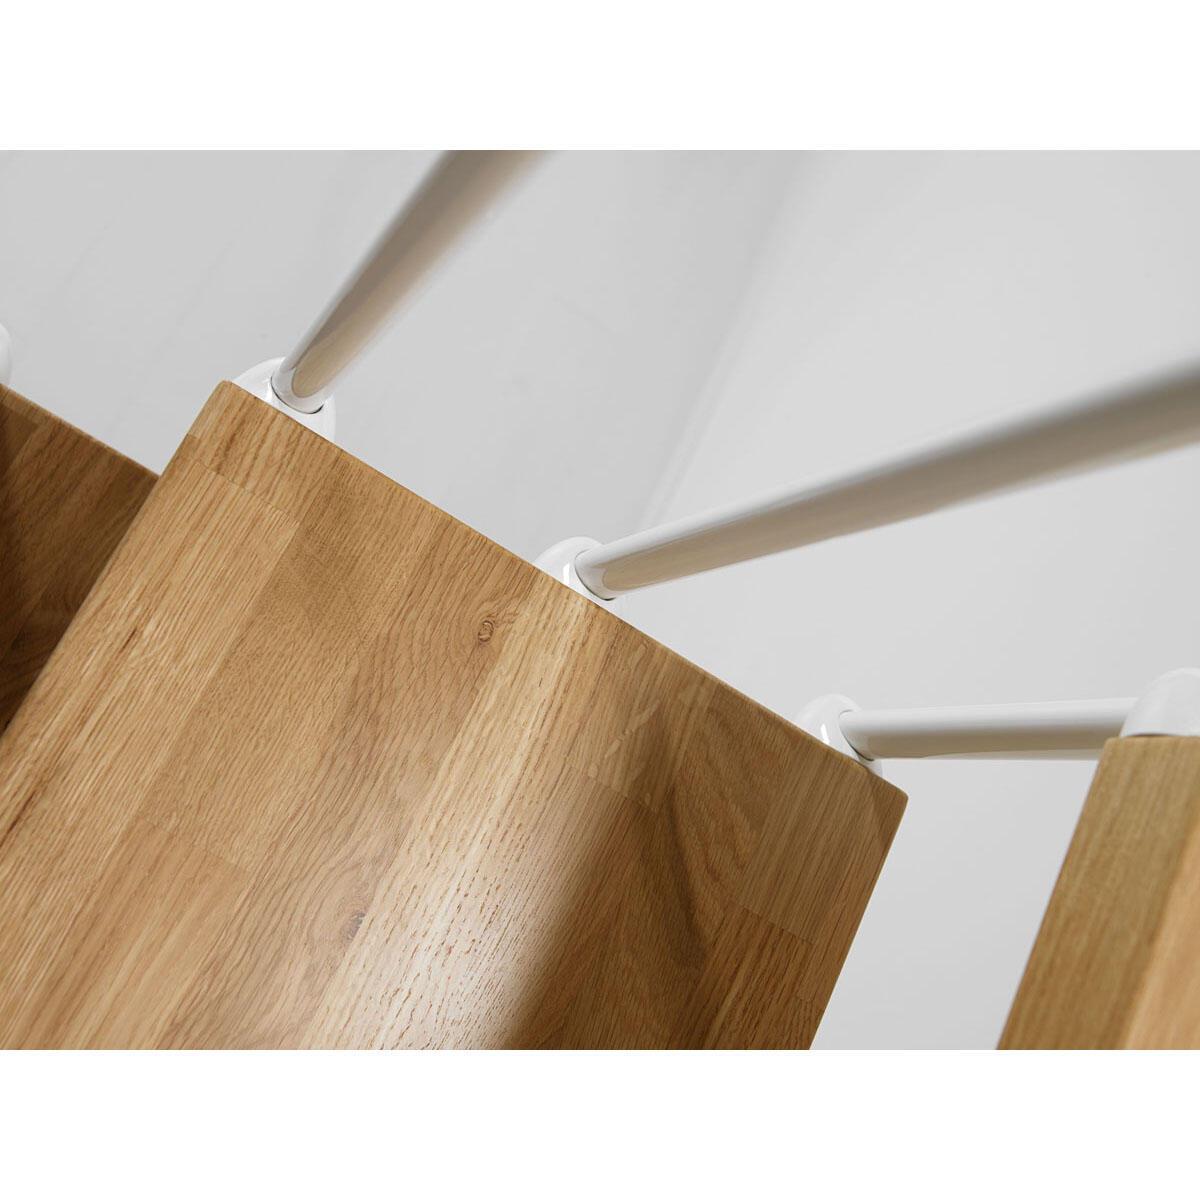 Scala a rampa 1/4 di giro OAK90 FONTANOT L 90 cm, gradino rovere, struttura bianco - 7